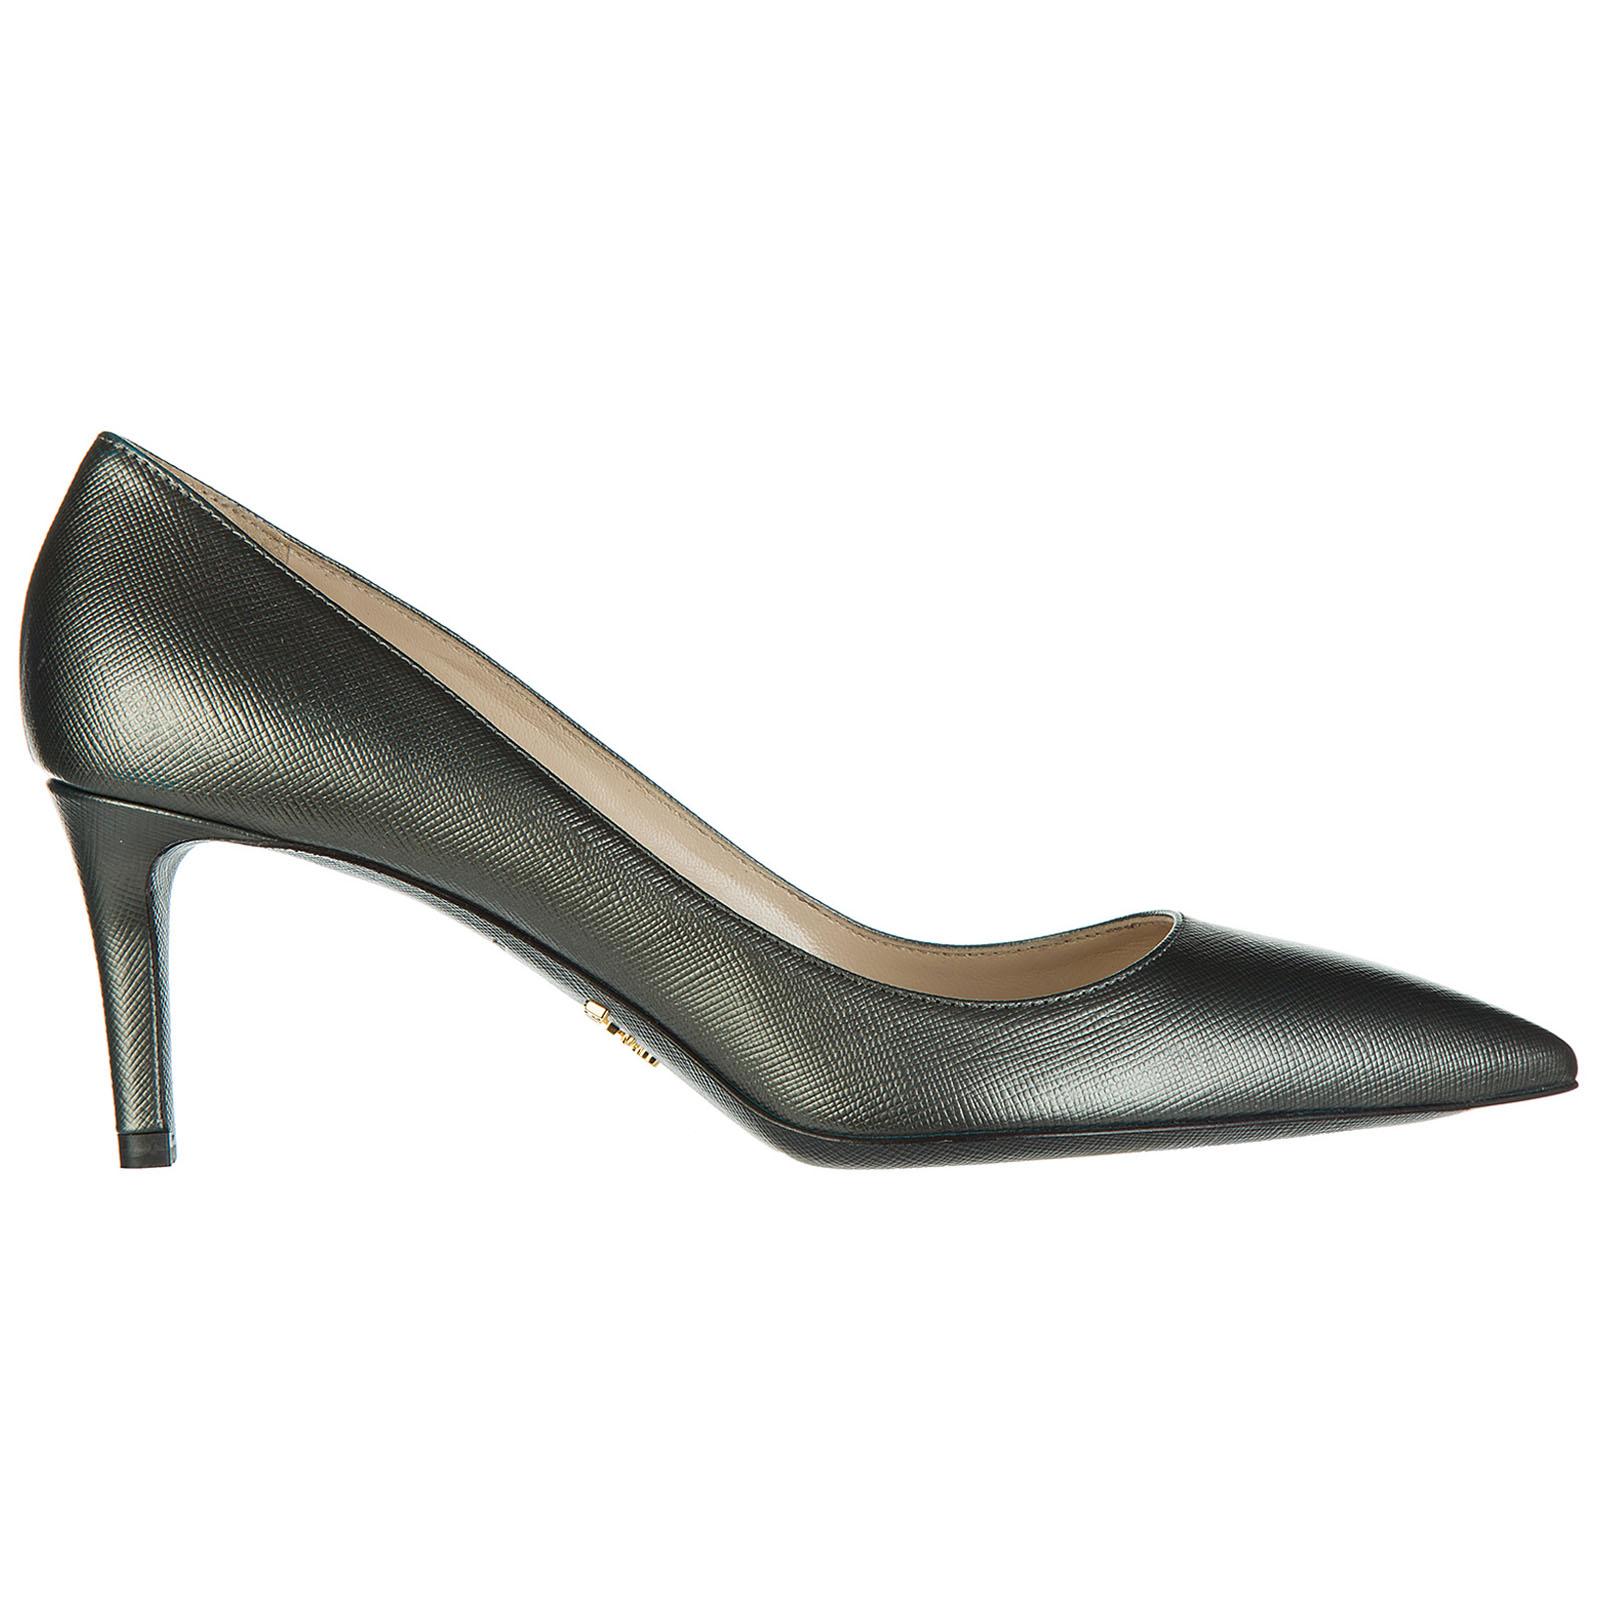 Decolletes decoltè scarpe con tacco pelle metal